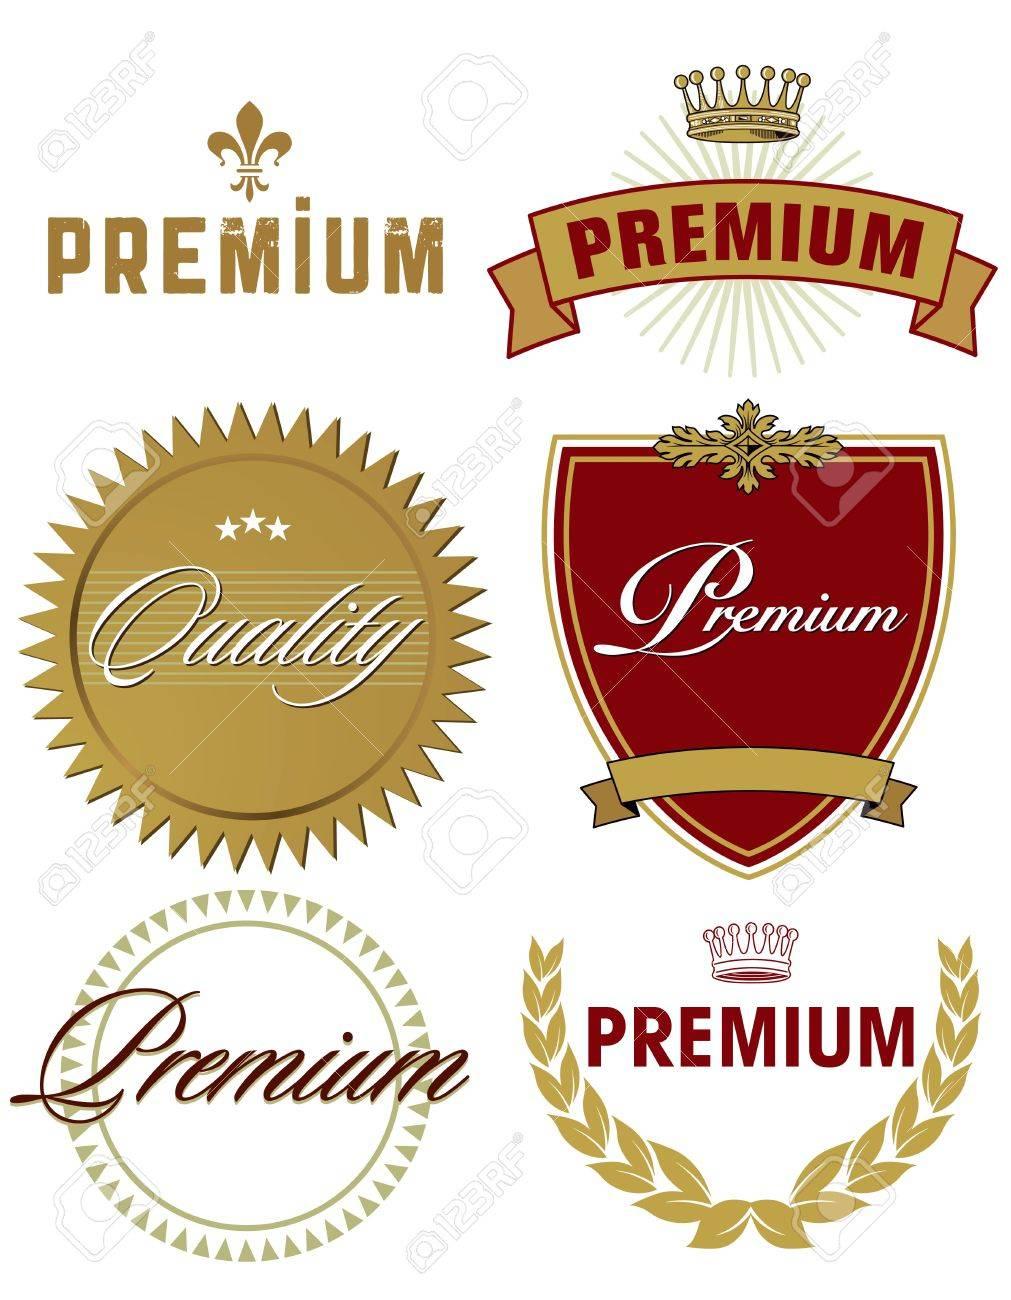 Premium image Stock Vector - 17329815